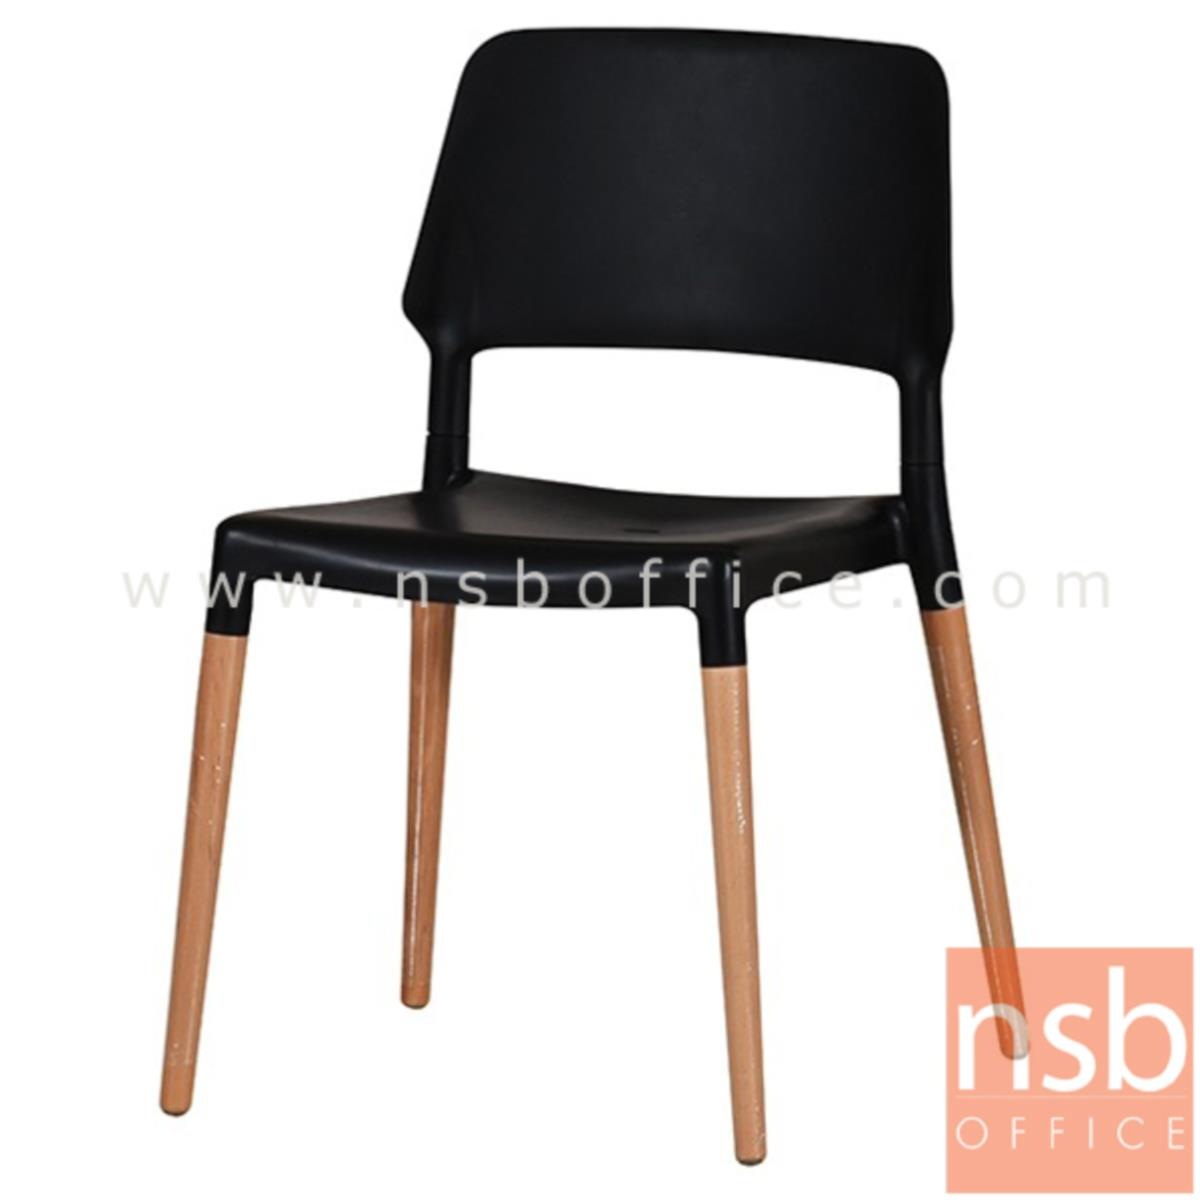 B29A208:เก้าอี้โมเดิร์นพลาสติกโพลี่ รุ่น Lockhart (ล็อกฮาร์ต) ขนาด 51.5W cm. ขาไม้สีบีช